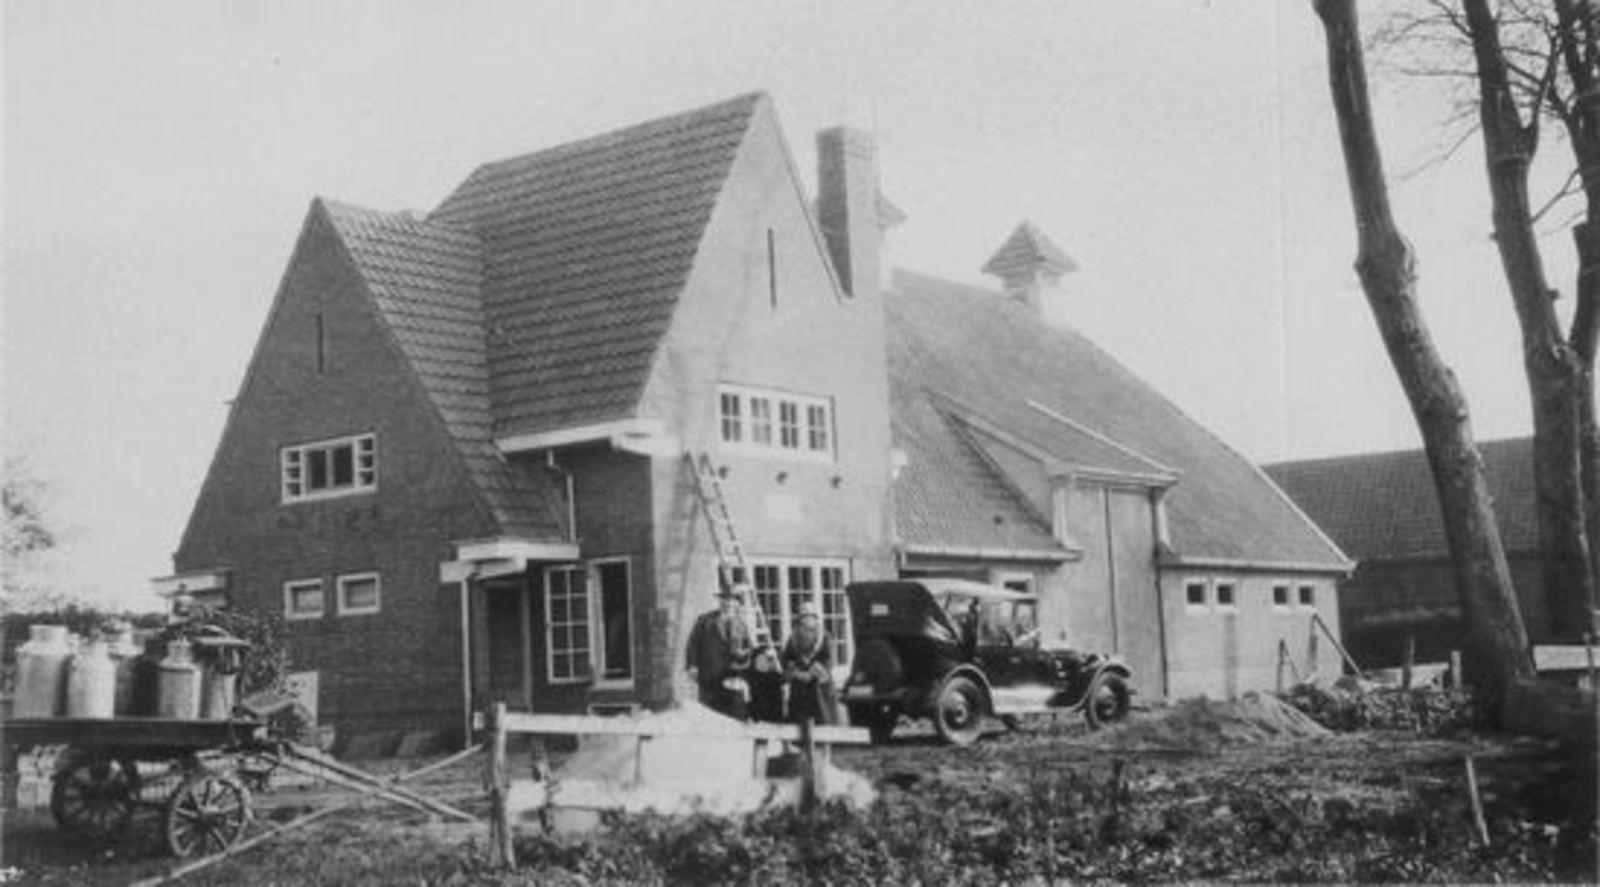 Cruquiusdijk 0095 1925± Paulina Agneta Hoeve 01